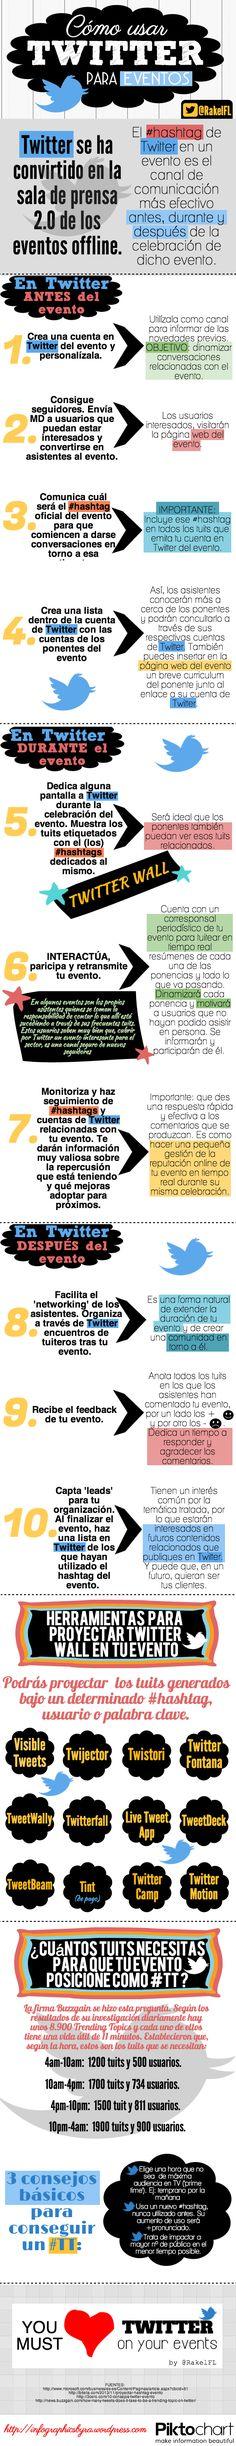 para evento, infografia, cómo usar, infografía, usar twitter, social media, twitter para, socialmedia, rede social